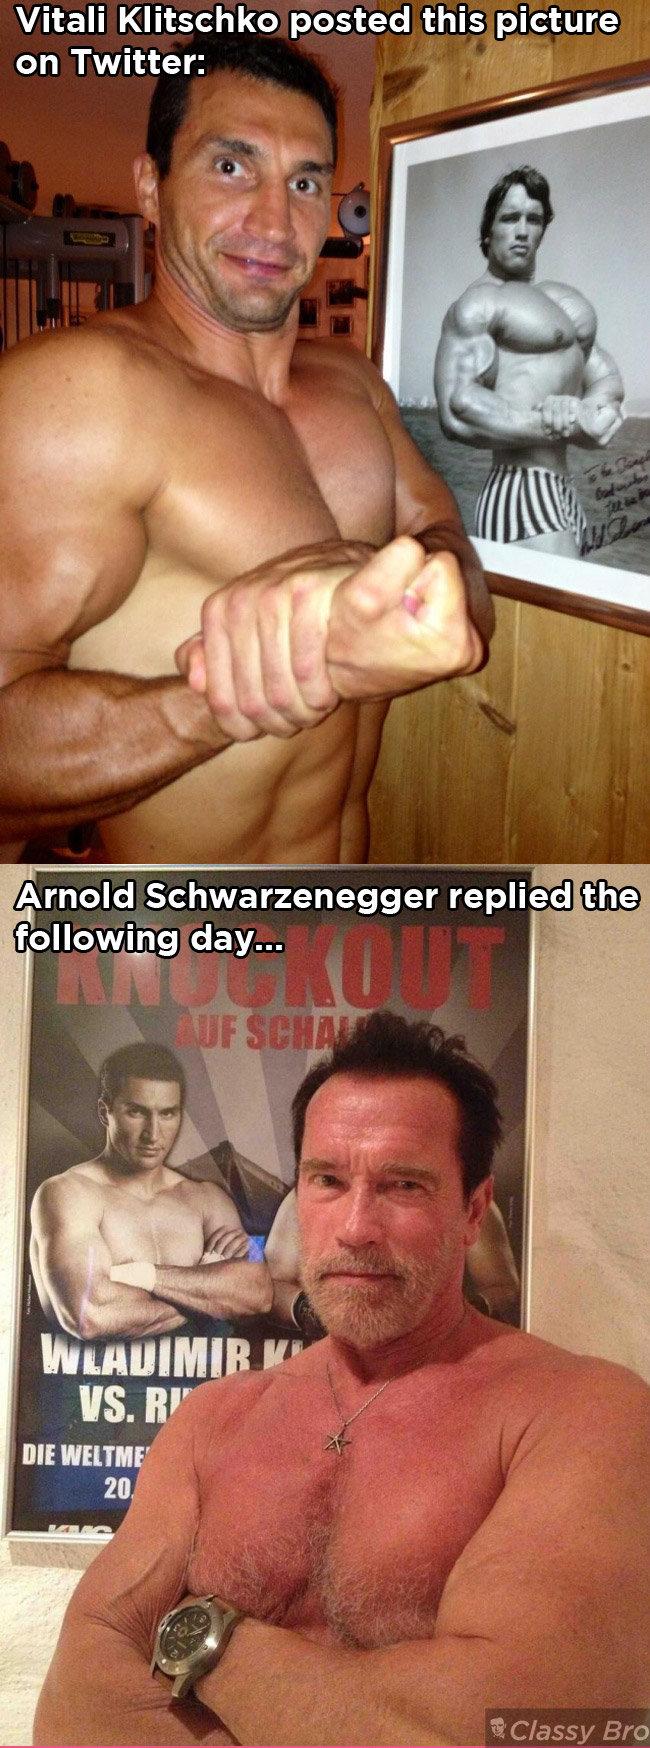 .... Hot Girls... www.classybro.com/category/girls. Vitali Klitschko posted this picture Arnold rero)